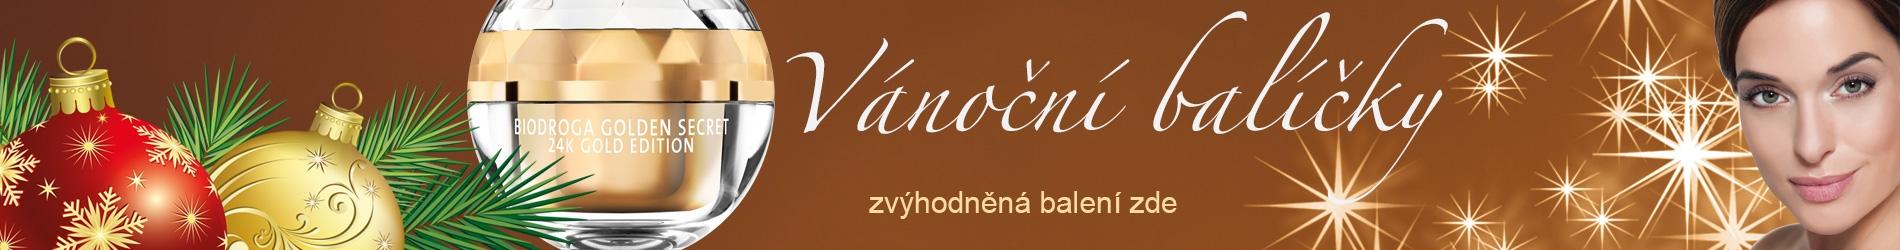 vanoce-balicky-2018.jpg